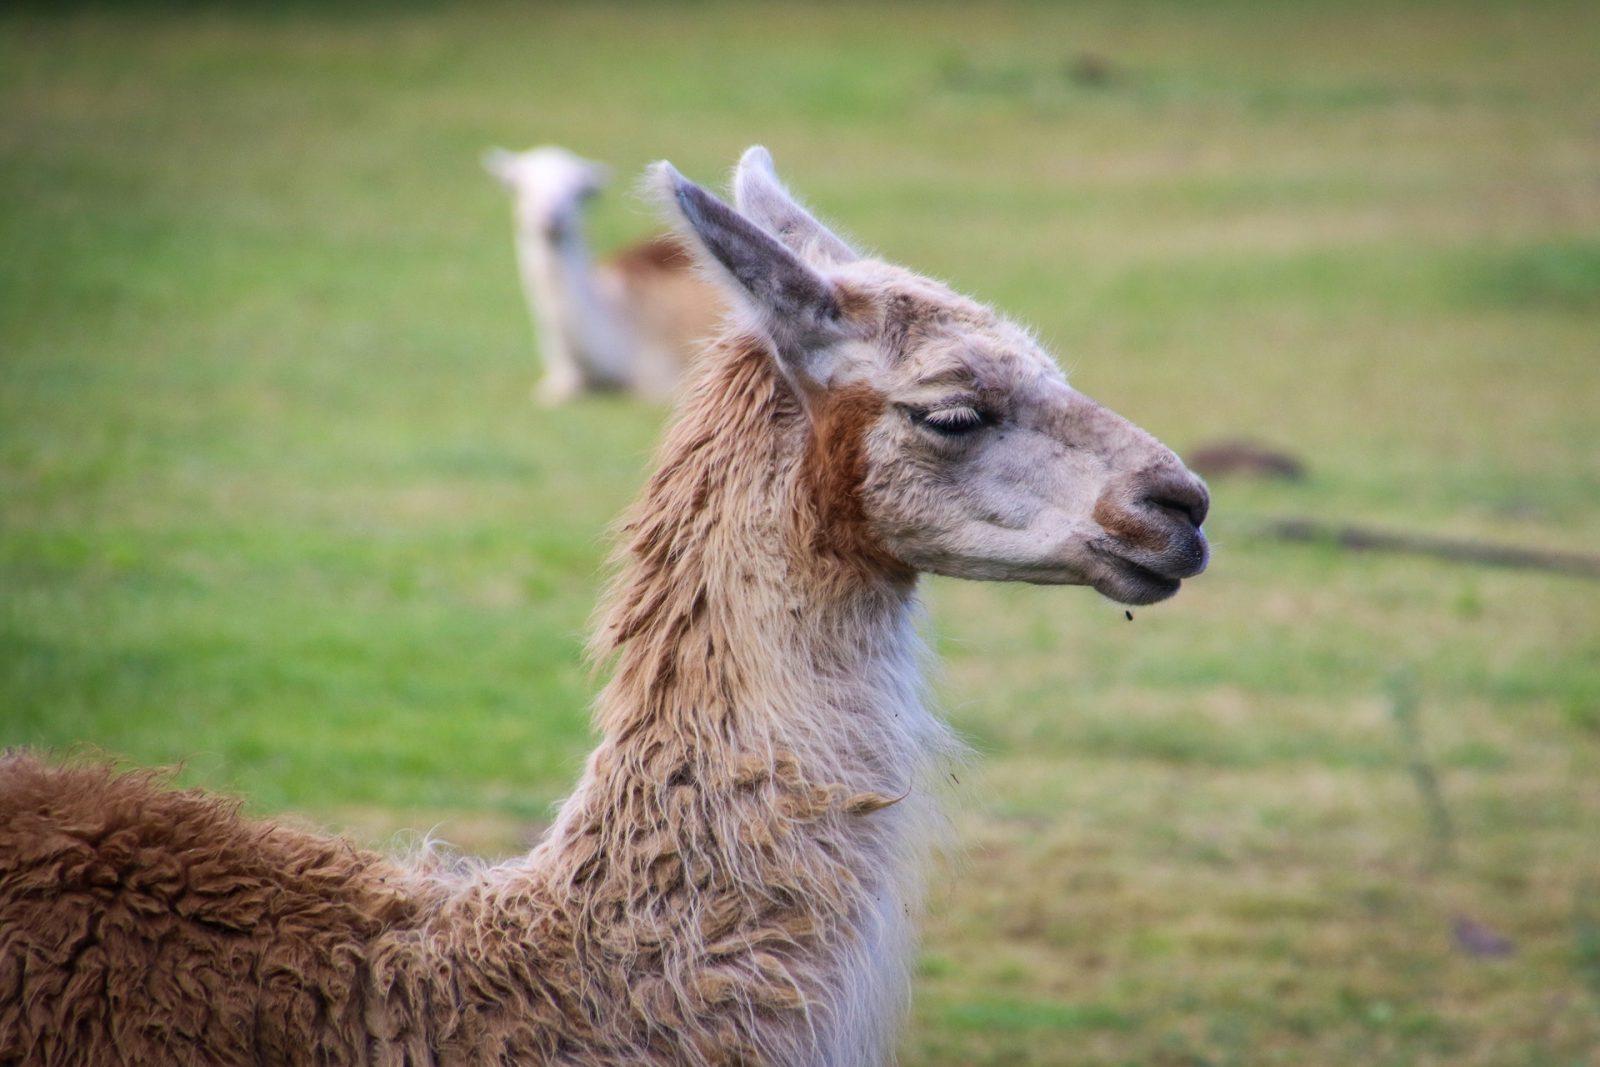 lhama: mamífero ruminante